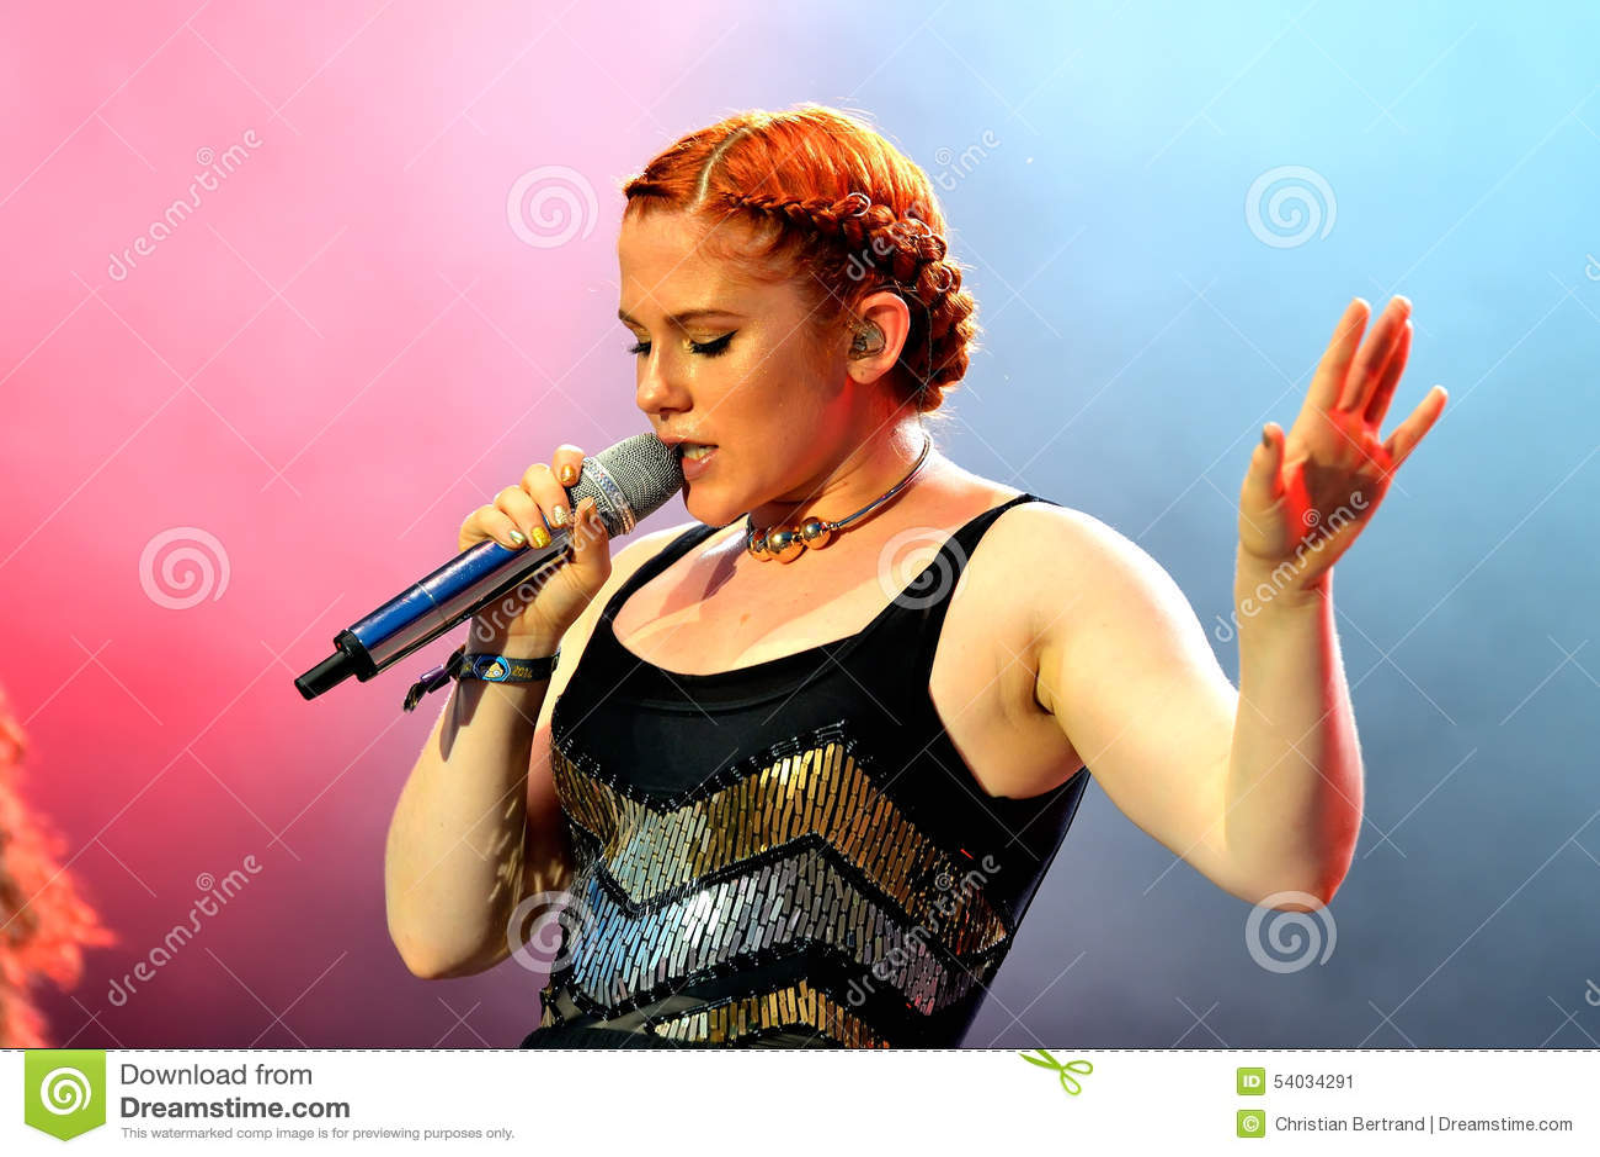 christian singer women redhead jpg 1200x900